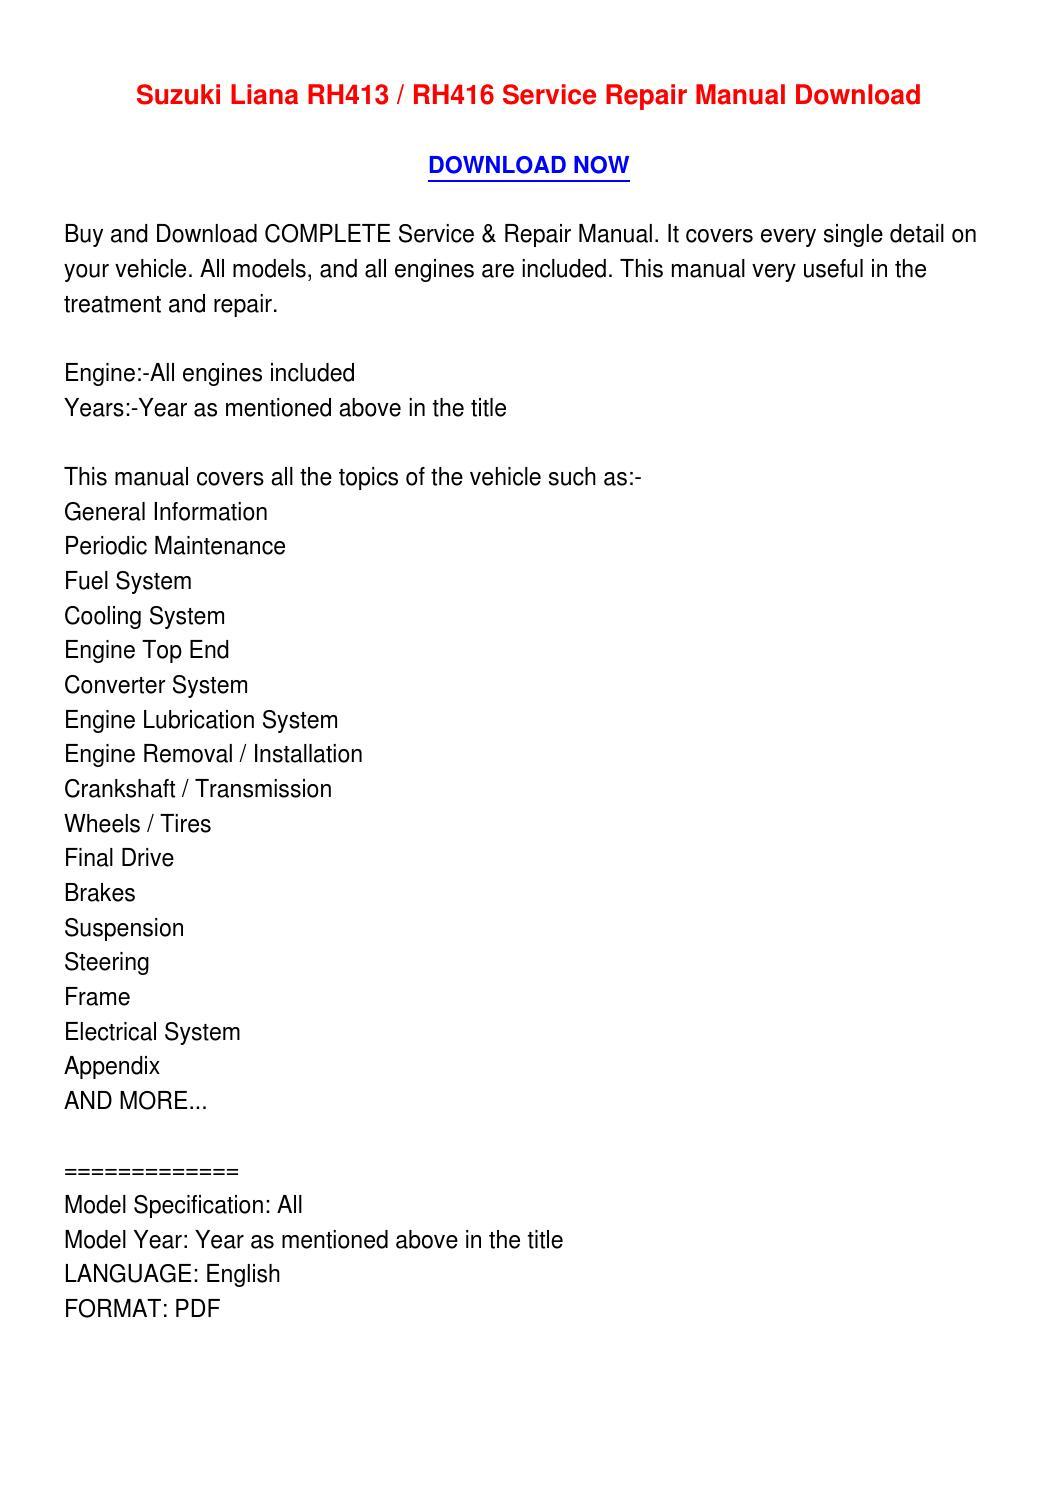 Suzuki Liana Rh413 Rh416 Service Repair Manual Download By